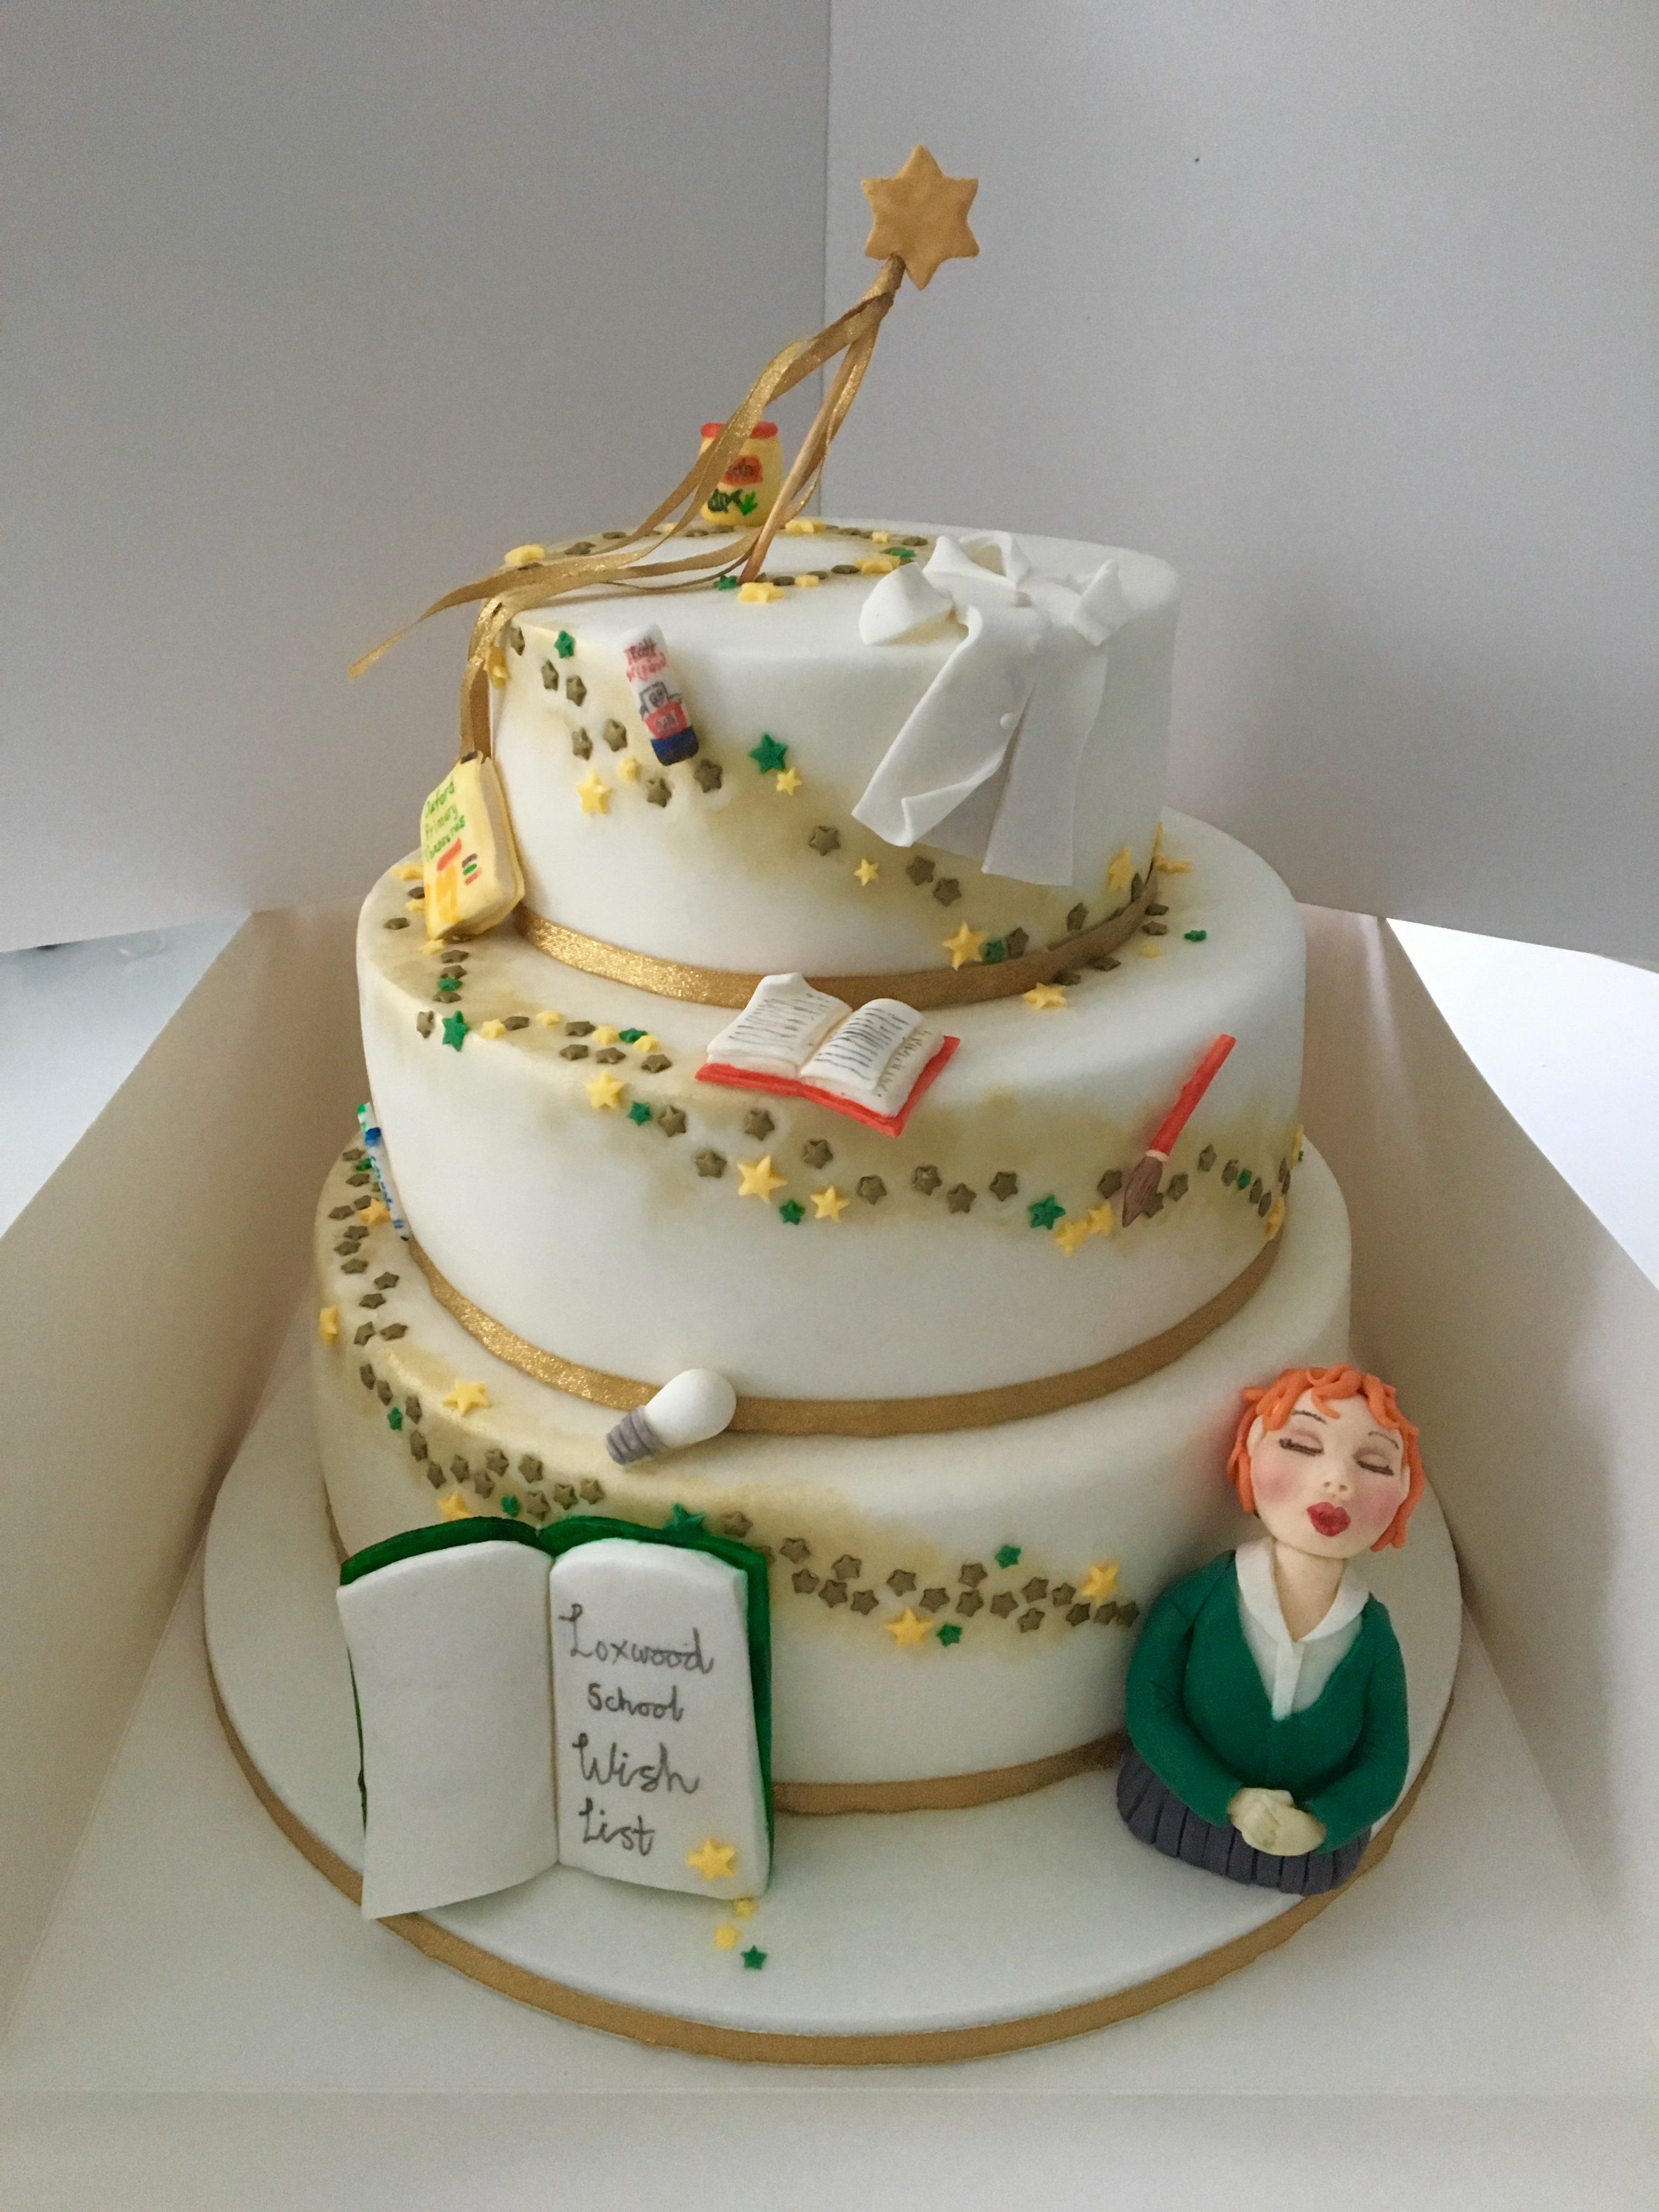 Wishlist Cake for Loxwood School